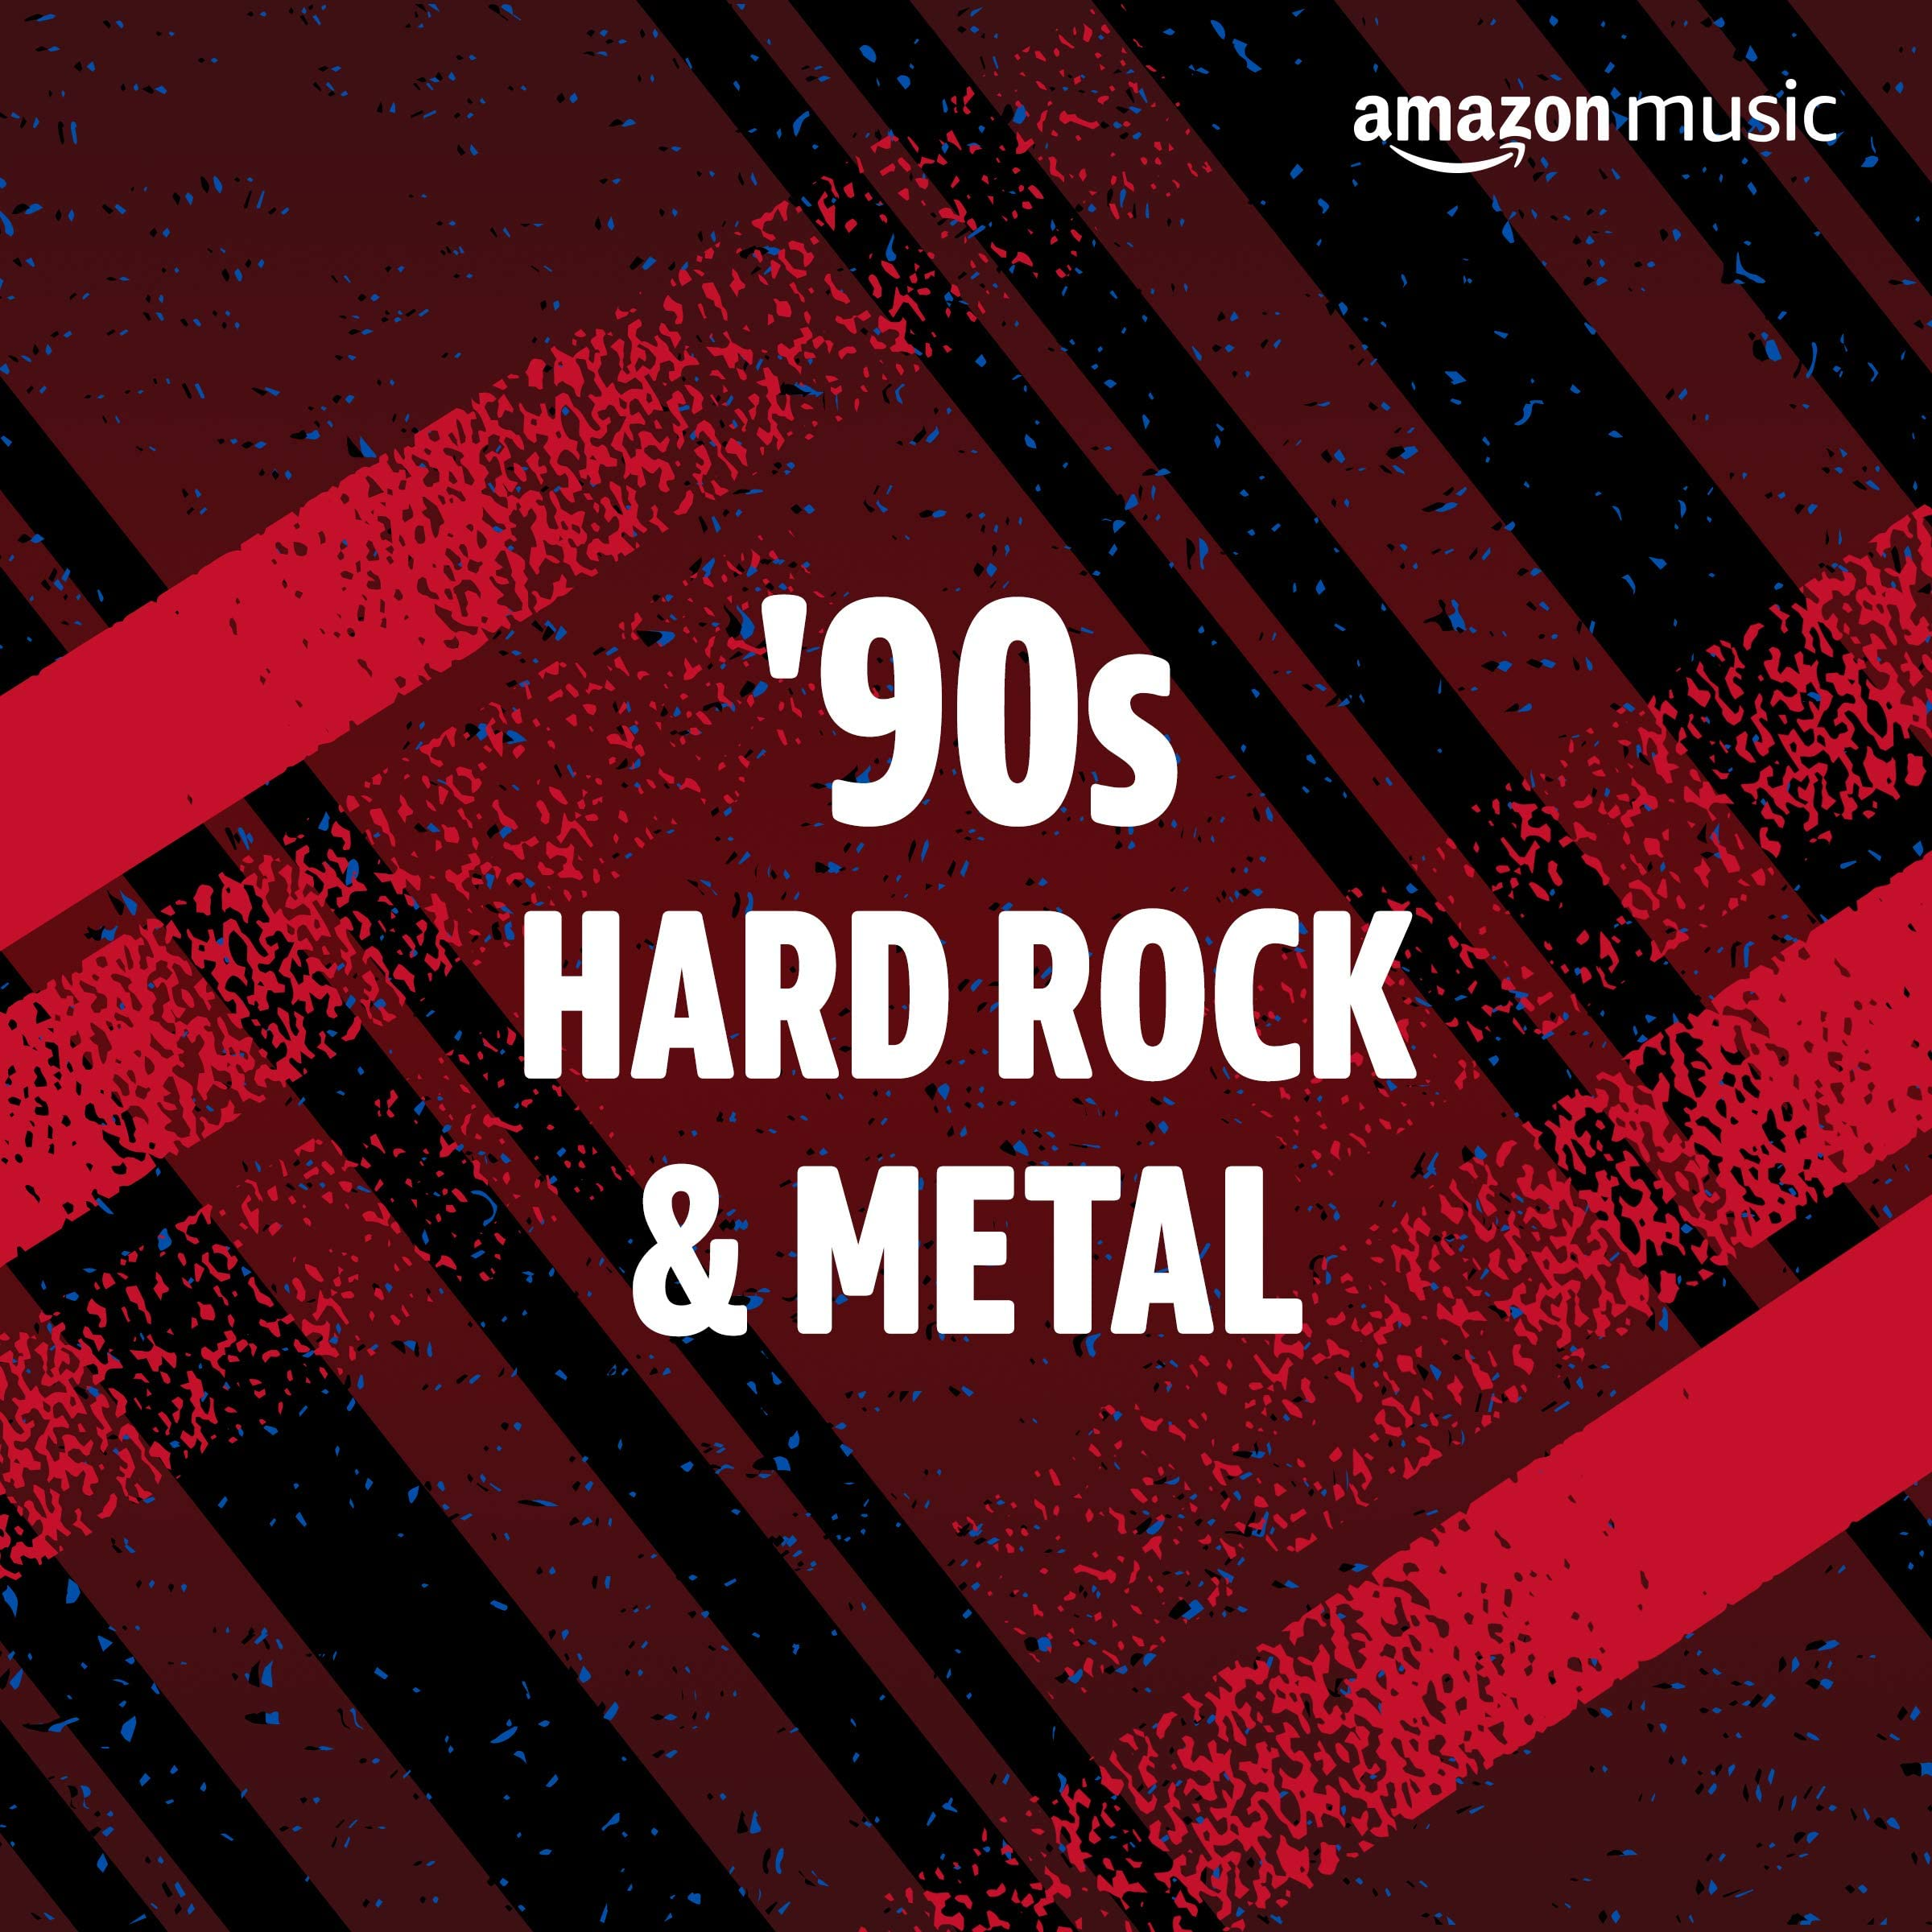 90s Hard Rock & Metal